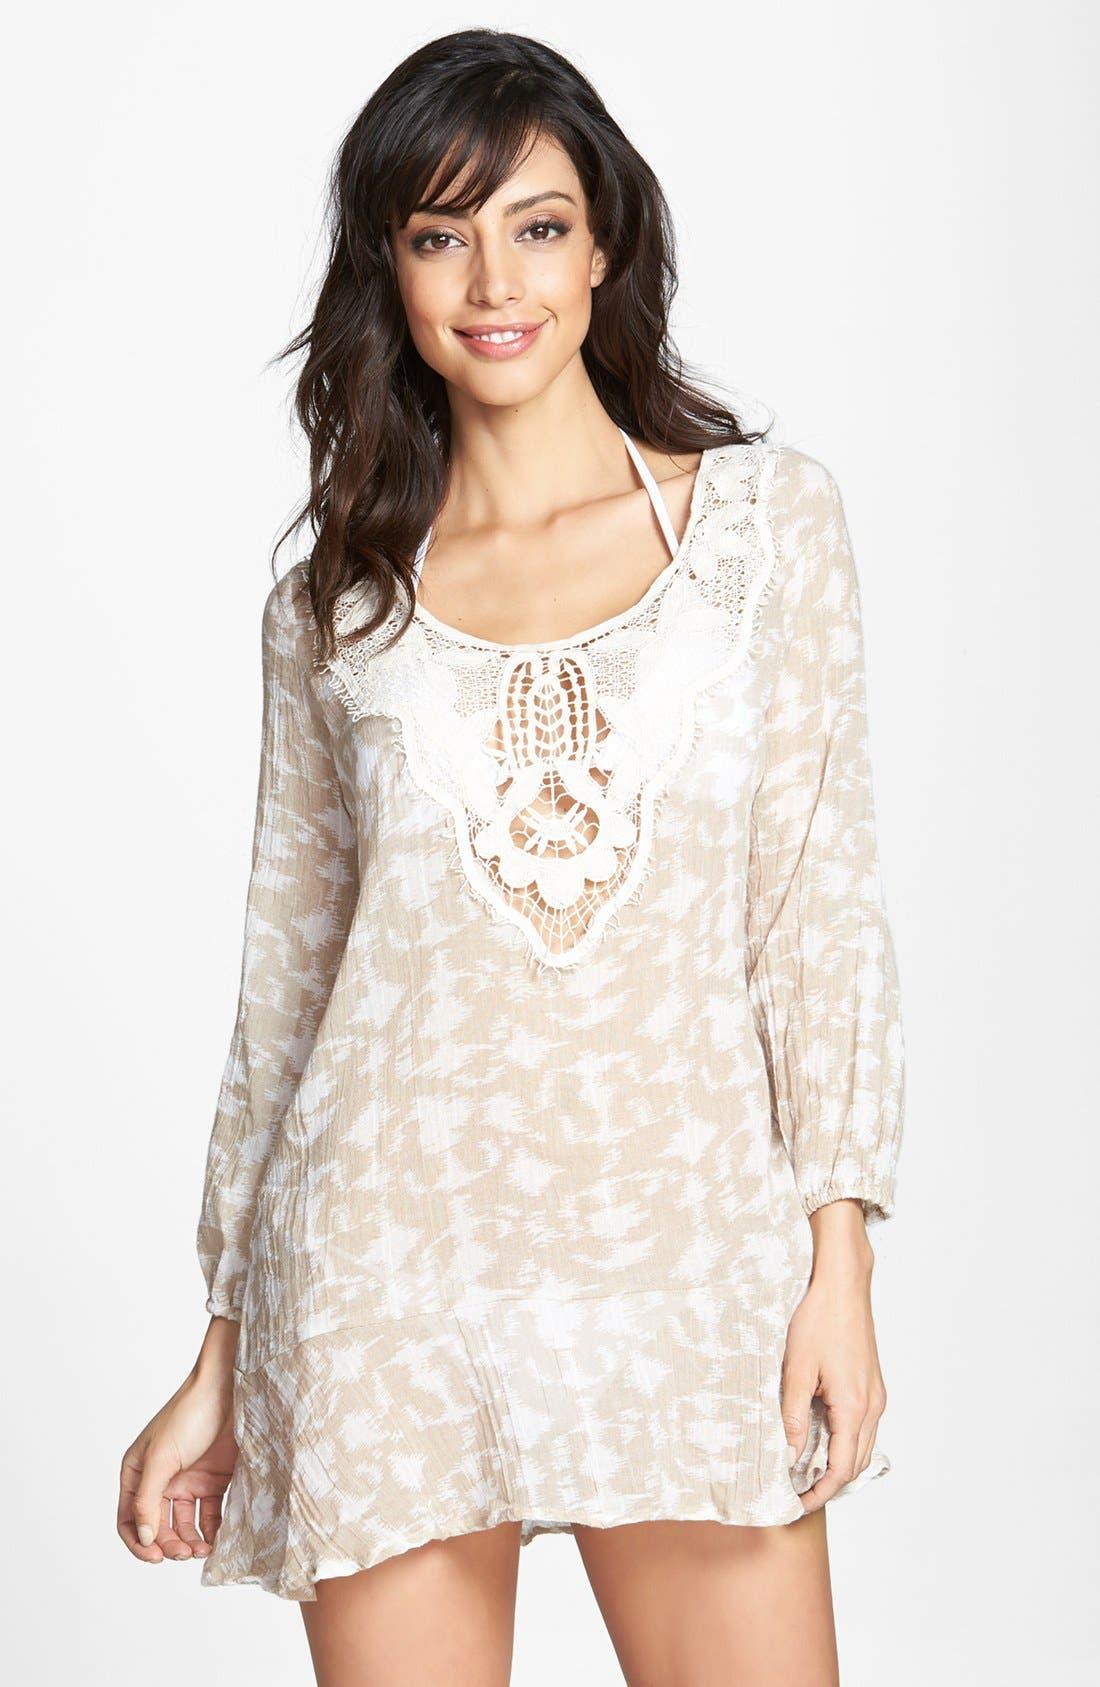 Alternate Image 1 Selected - Eberjey 'Hidden Cove Natalya' Lace Trim Ikat Cover-Up Dress